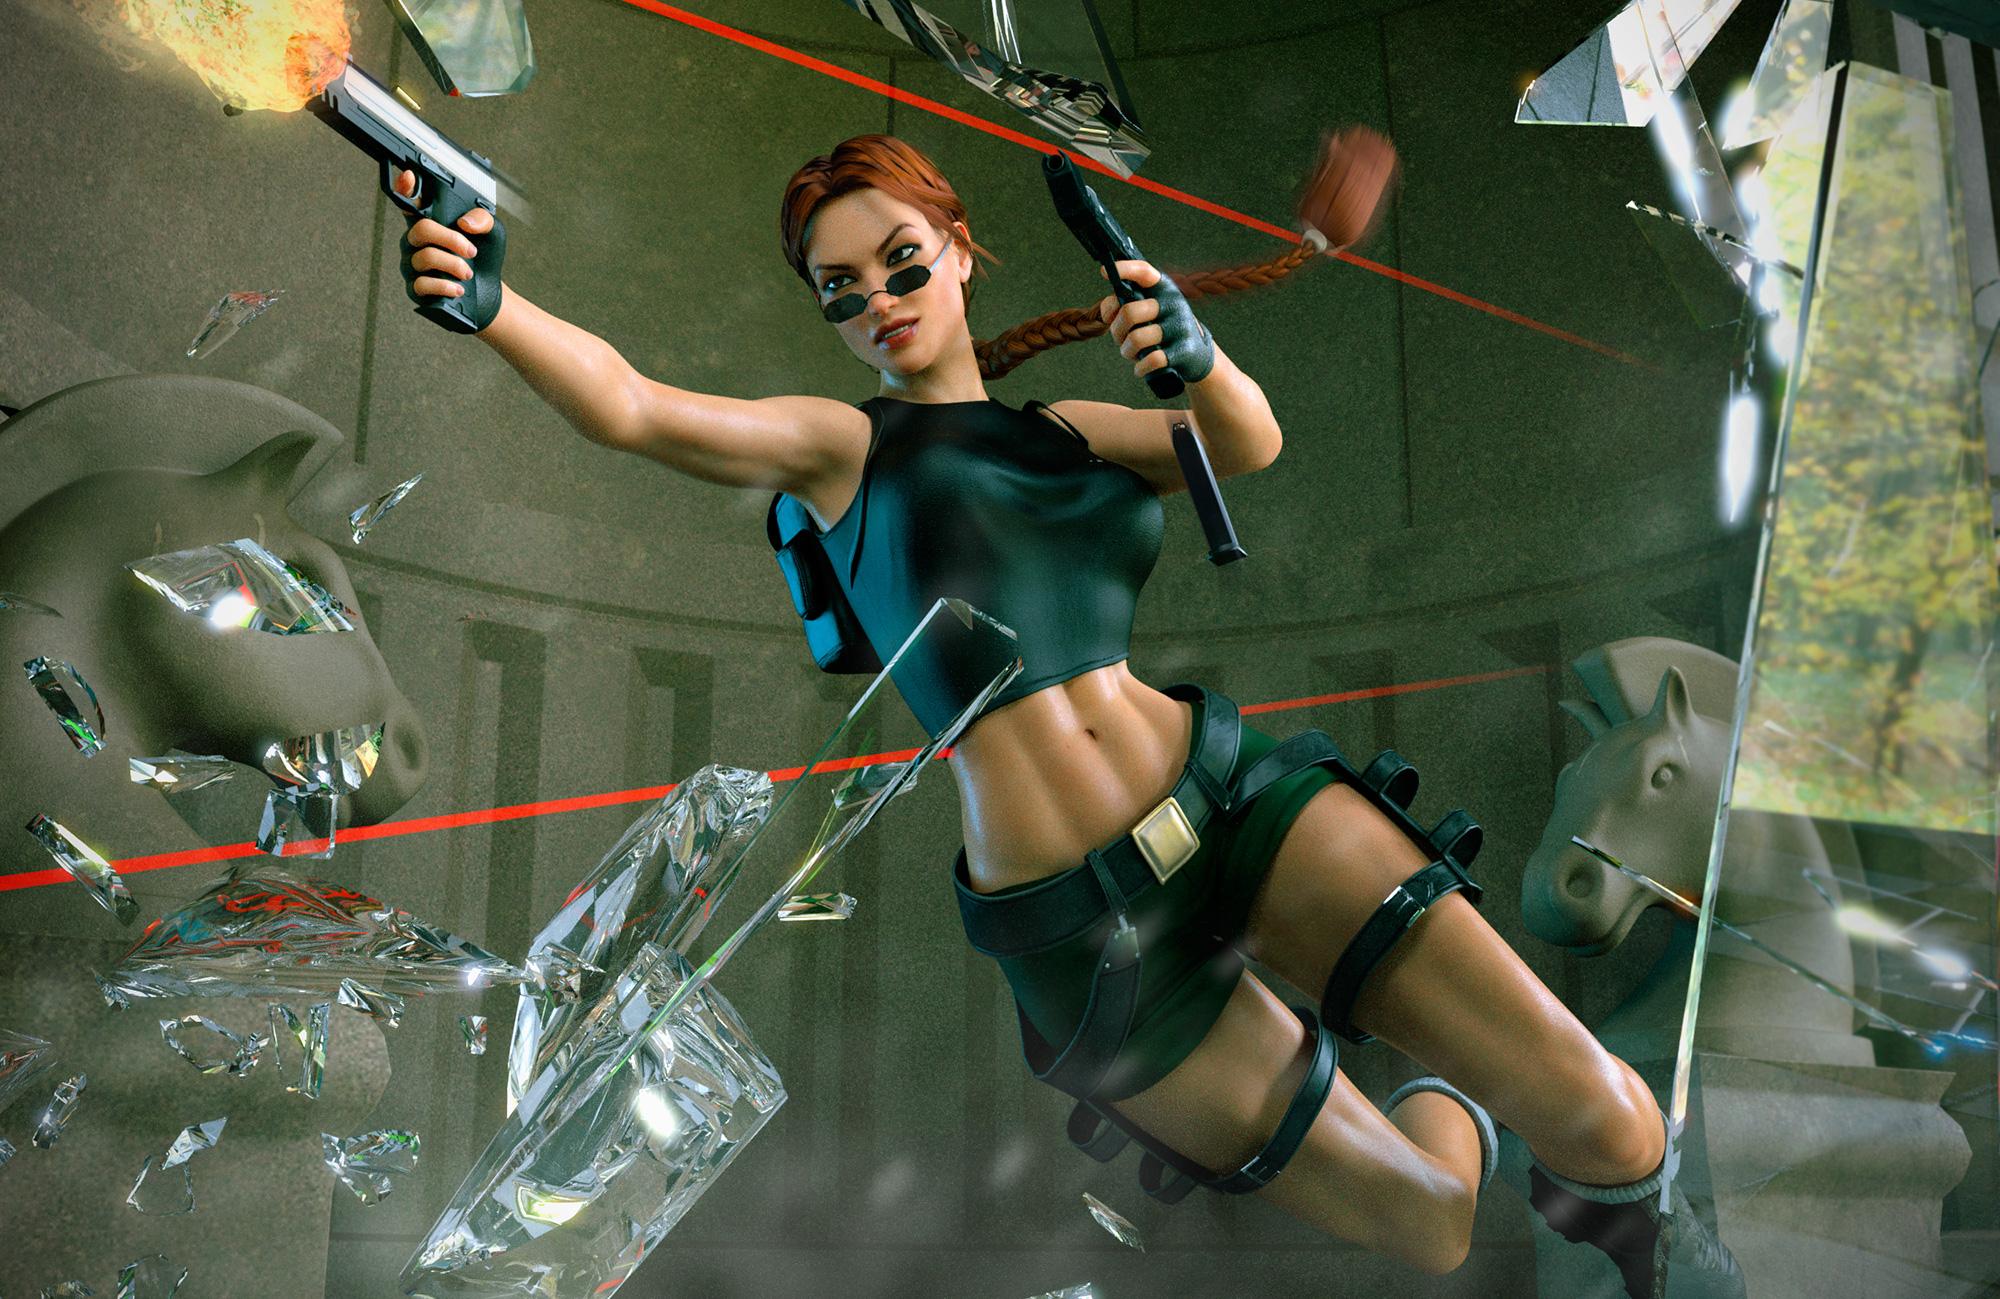 Tomb Raider 2018 1080p WEB-DL x265-BvS [MEGA]